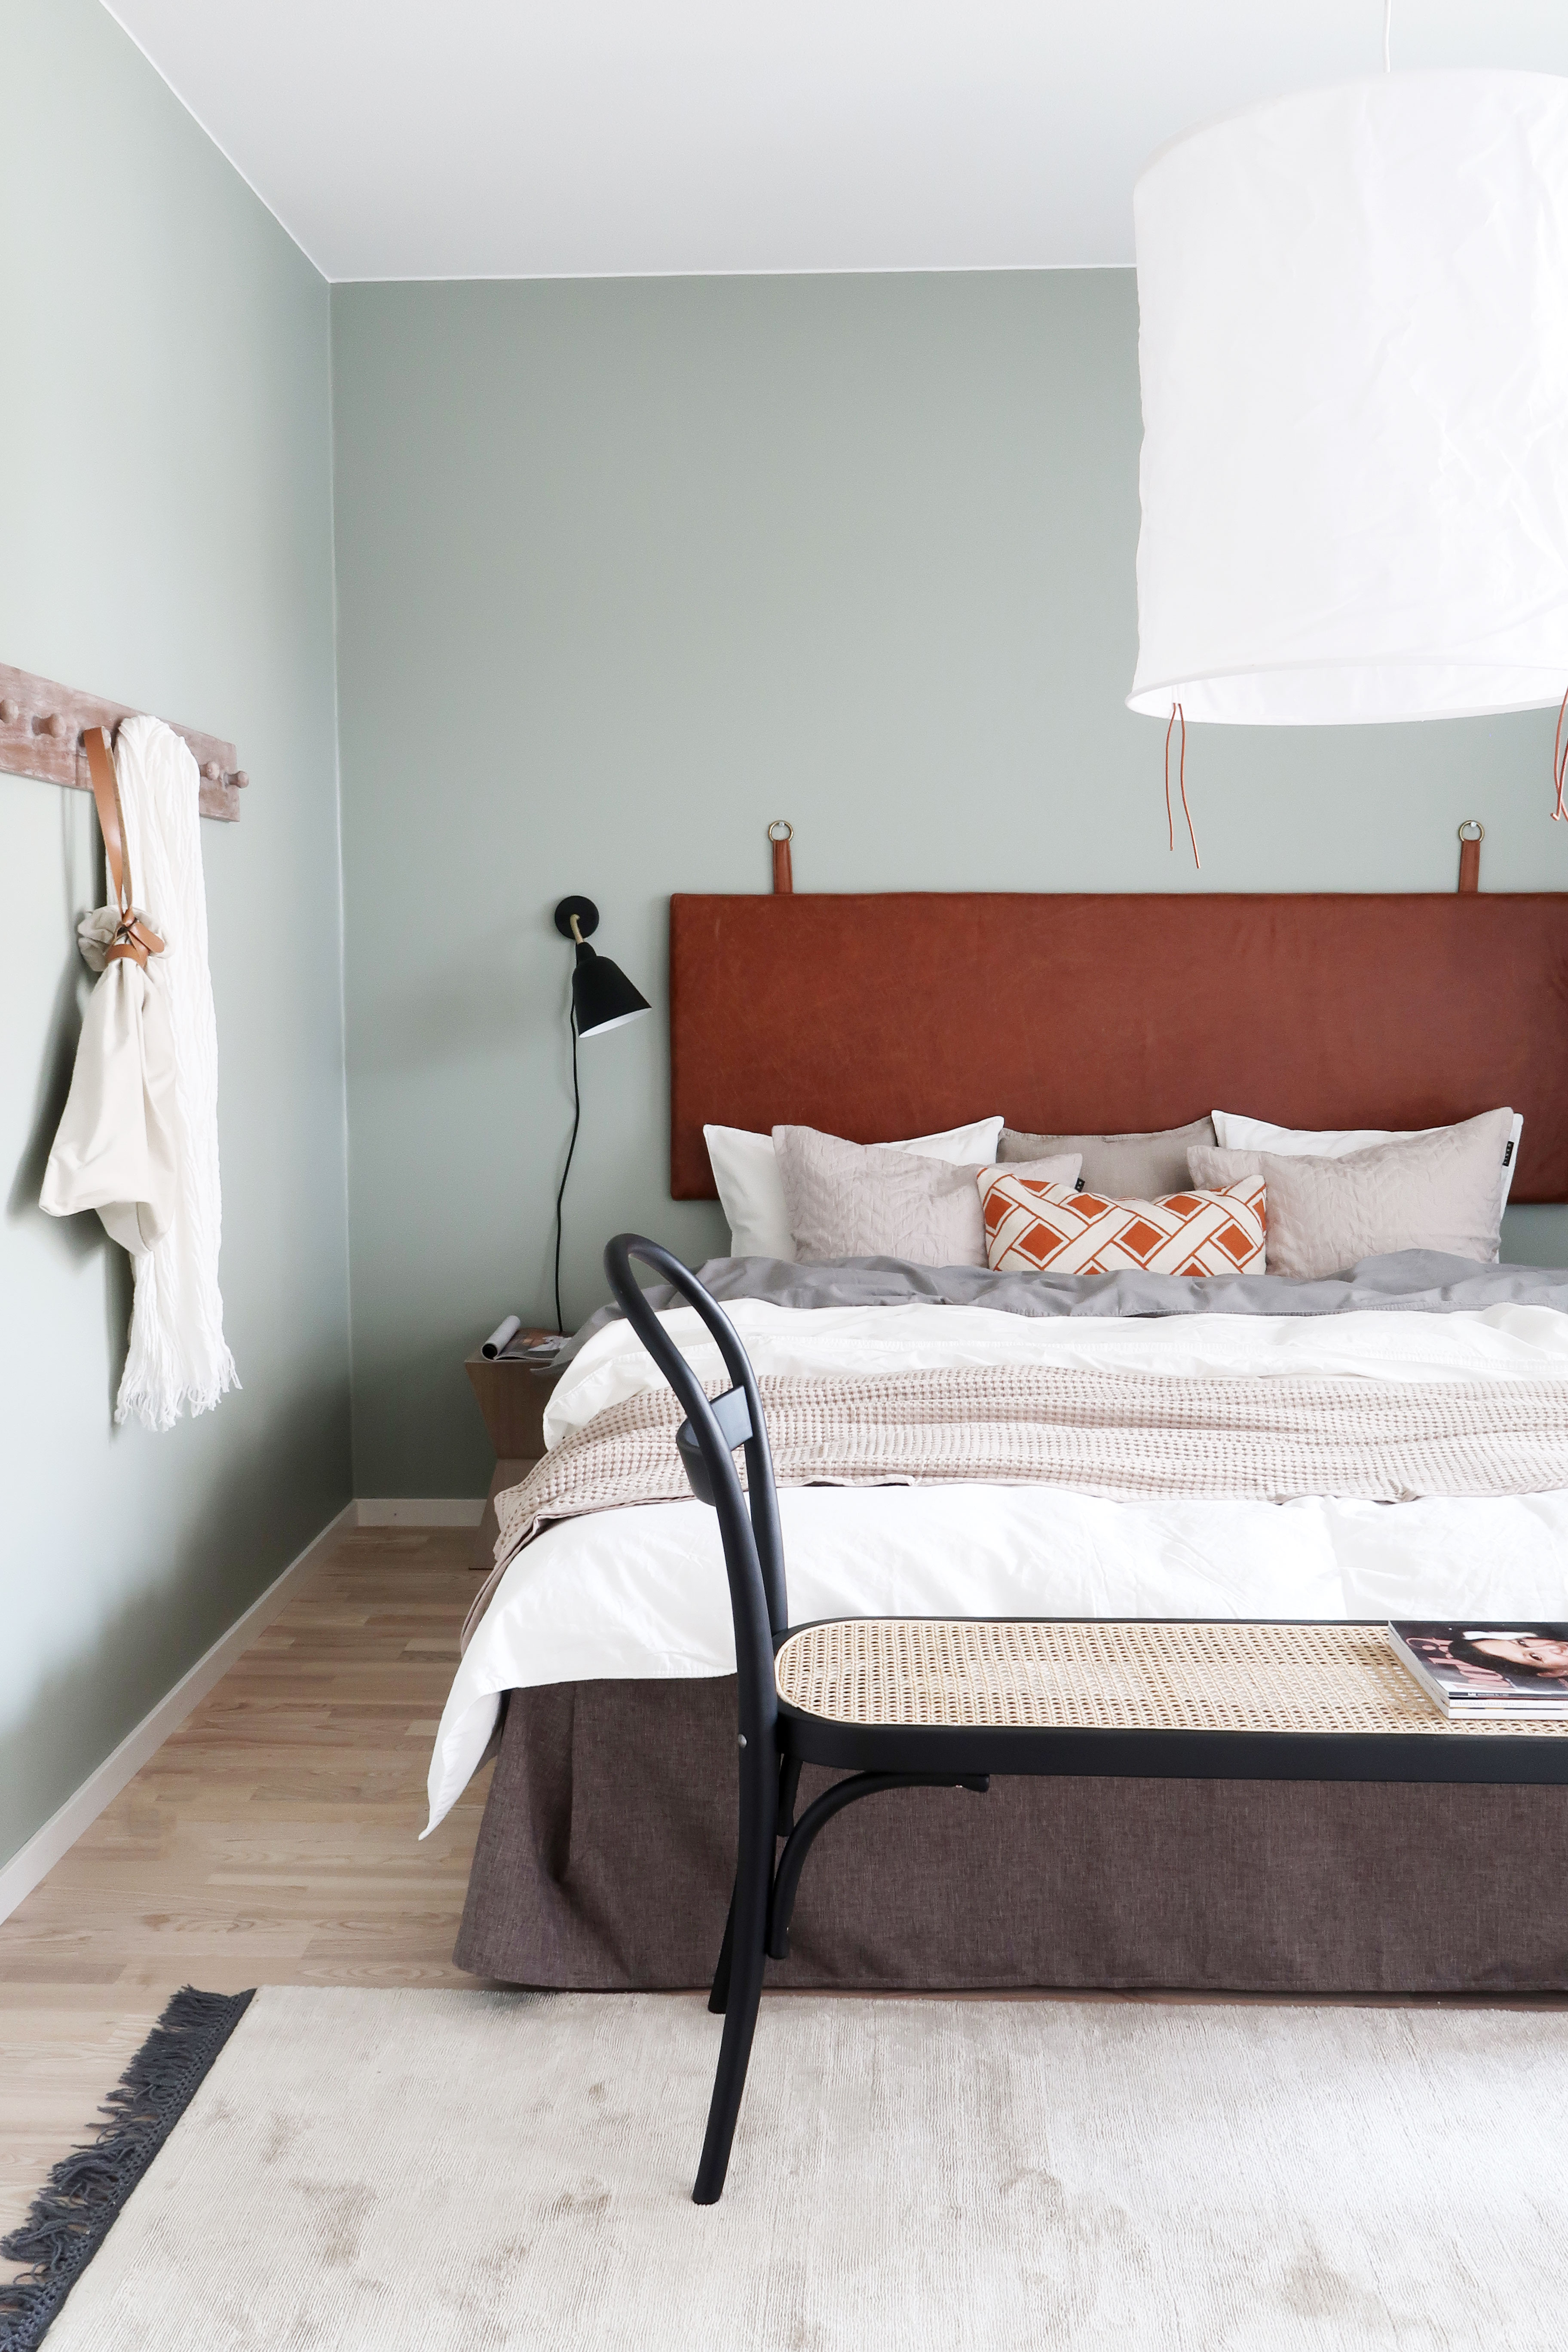 JM-slussen-sovrum-bedroom-interior-3